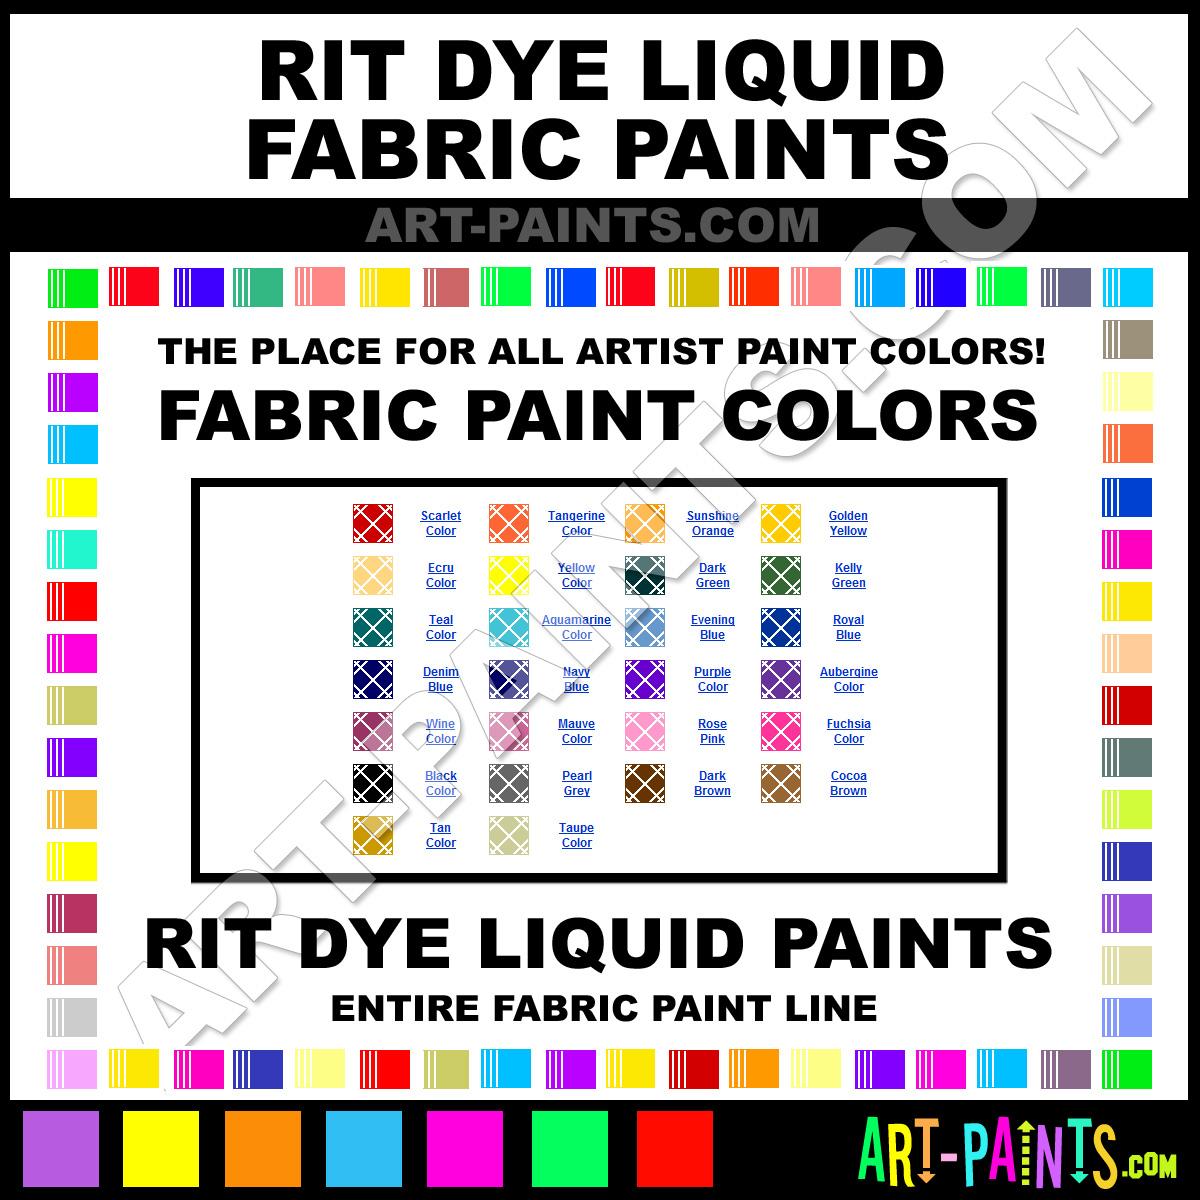 Rit dye liquid fabric textile paint colors rit dye liquid paint rit dye fabrics rit dye liquid paints nvjuhfo Image collections